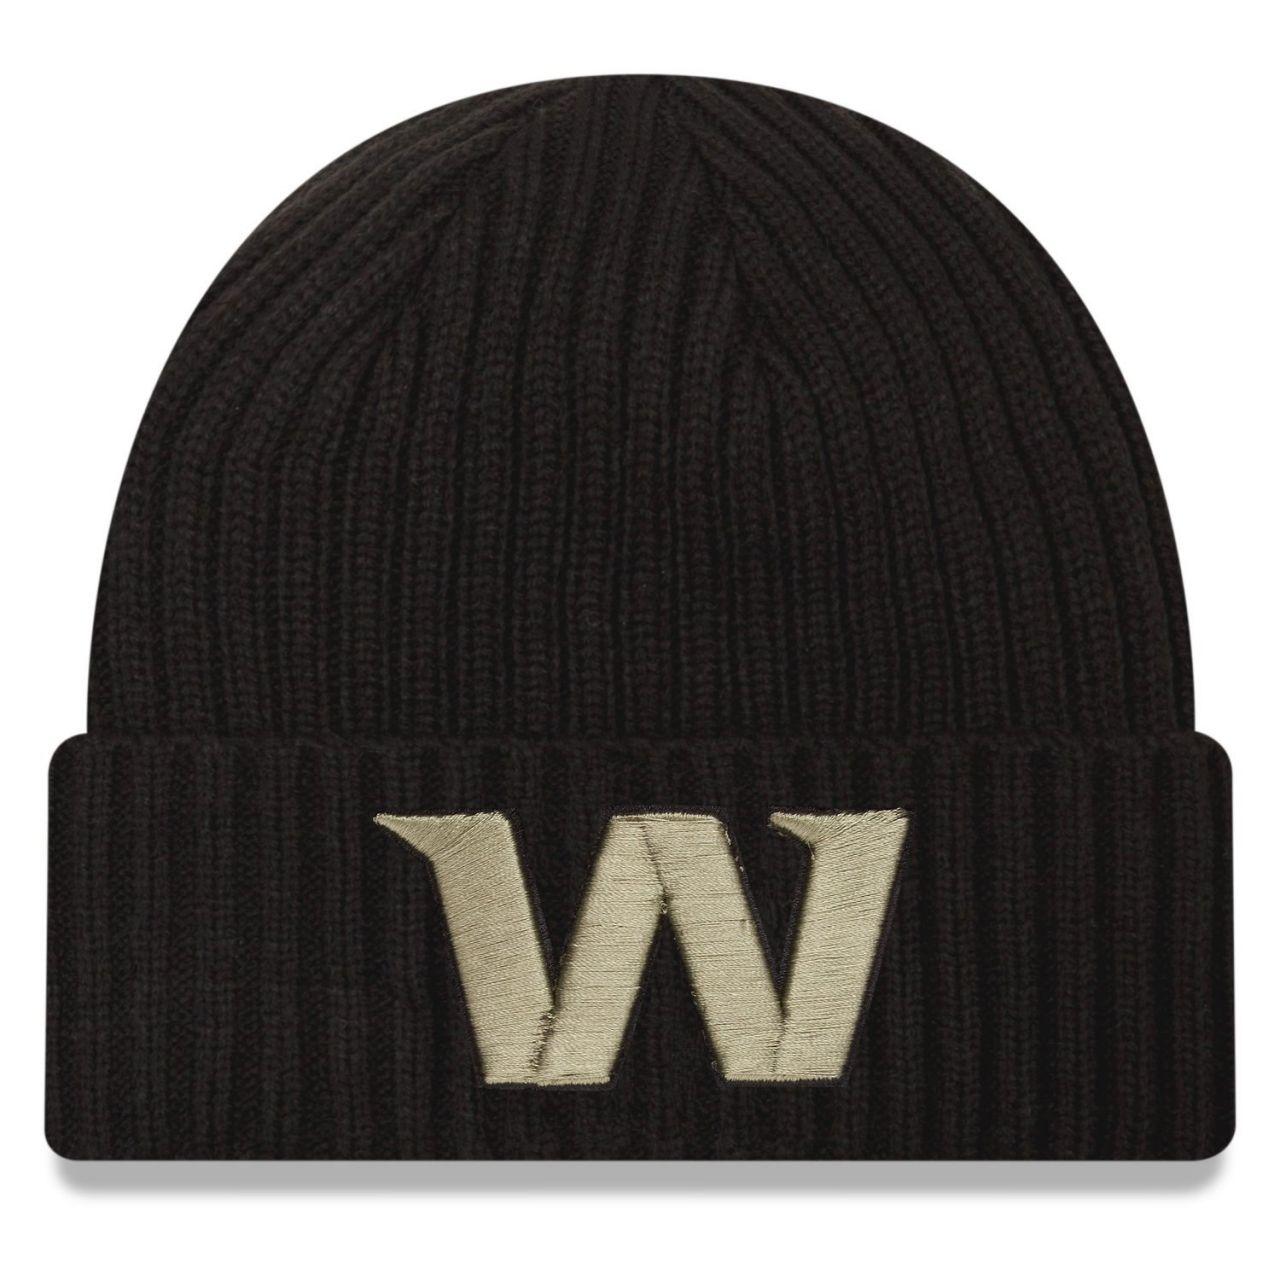 amfoo - New Era Salute to Service Wintermütze - Washington Team